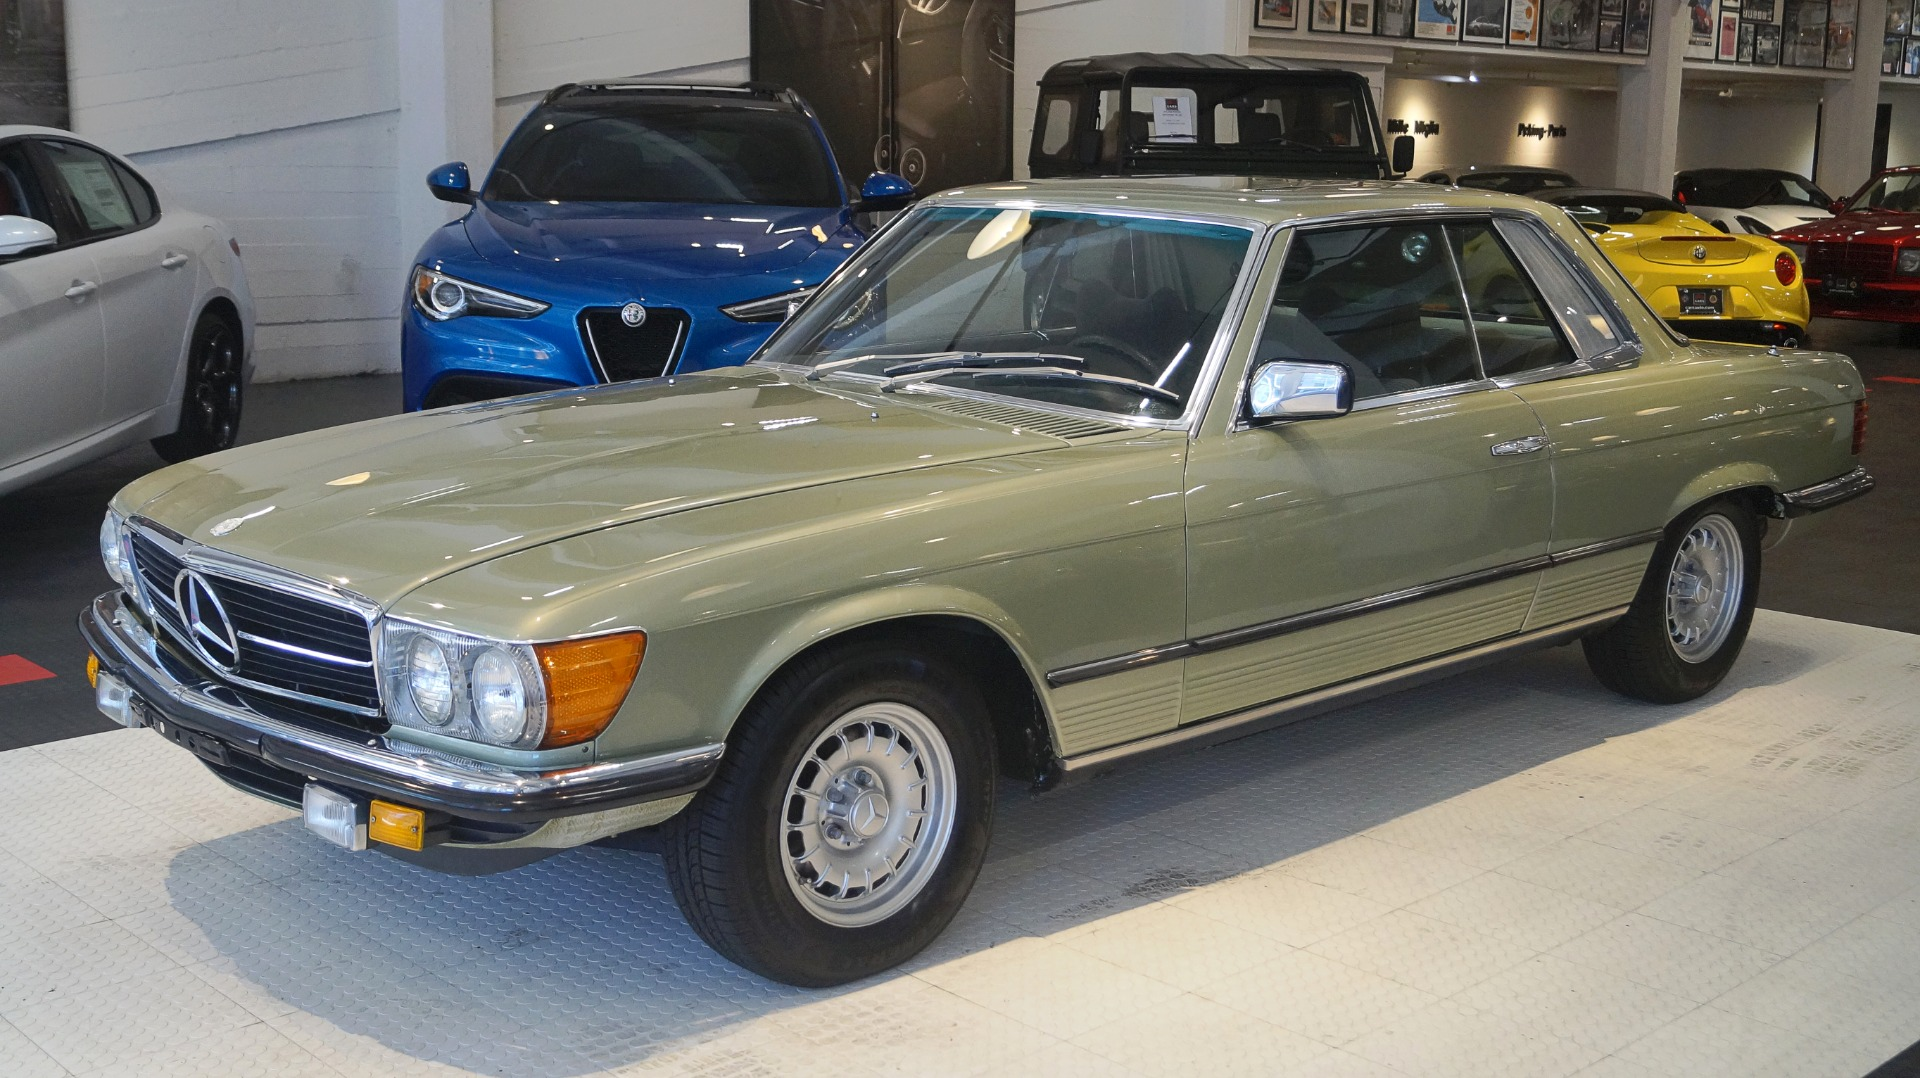 San Francisco Mercedes >> Used 1978 Mercedes Benz 450slc For Sale 20 700 Cars Dawydiak